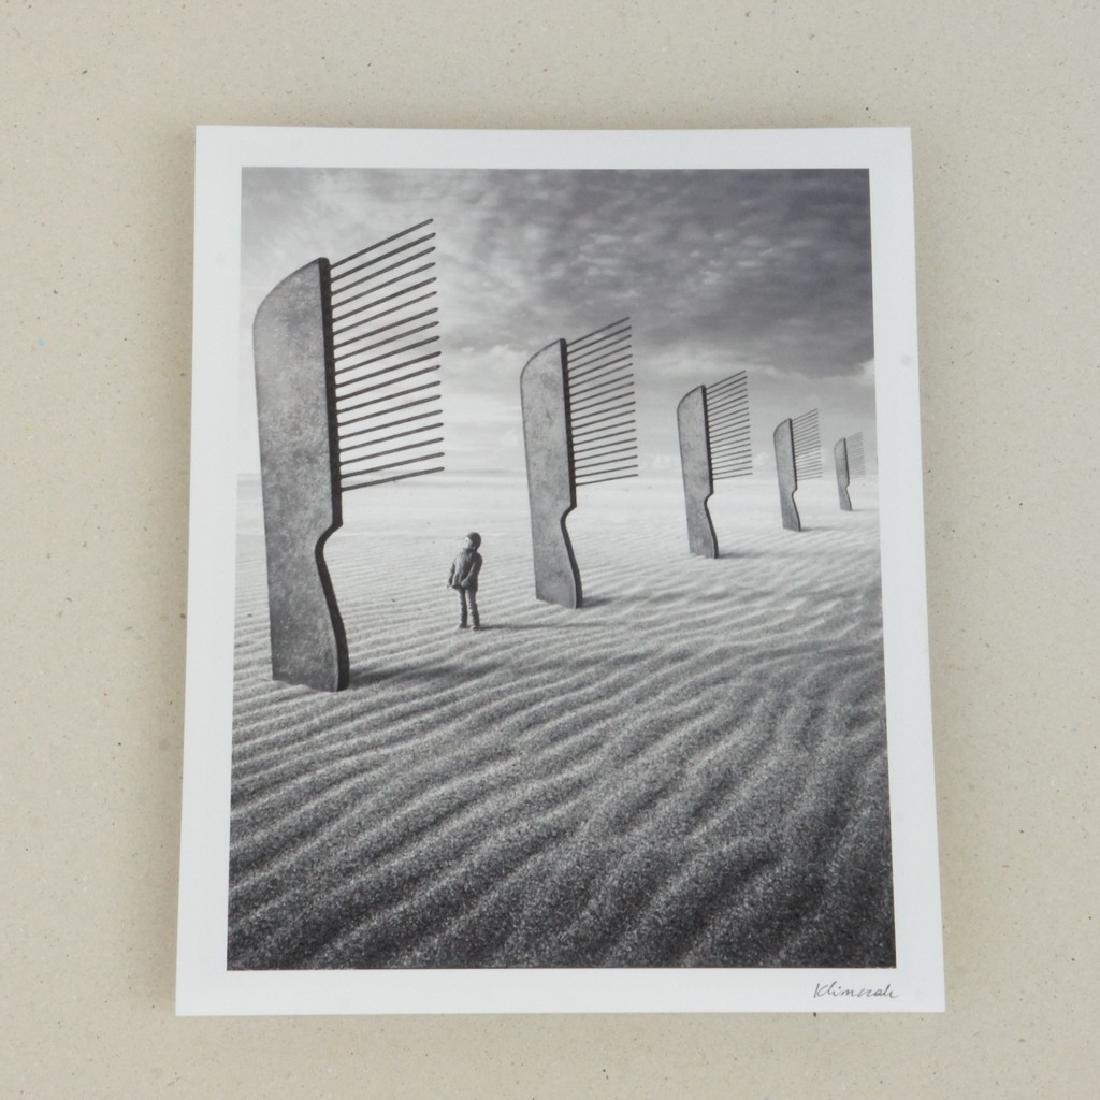 Dariusz Klimczak Print Inter Alia Folio - 2